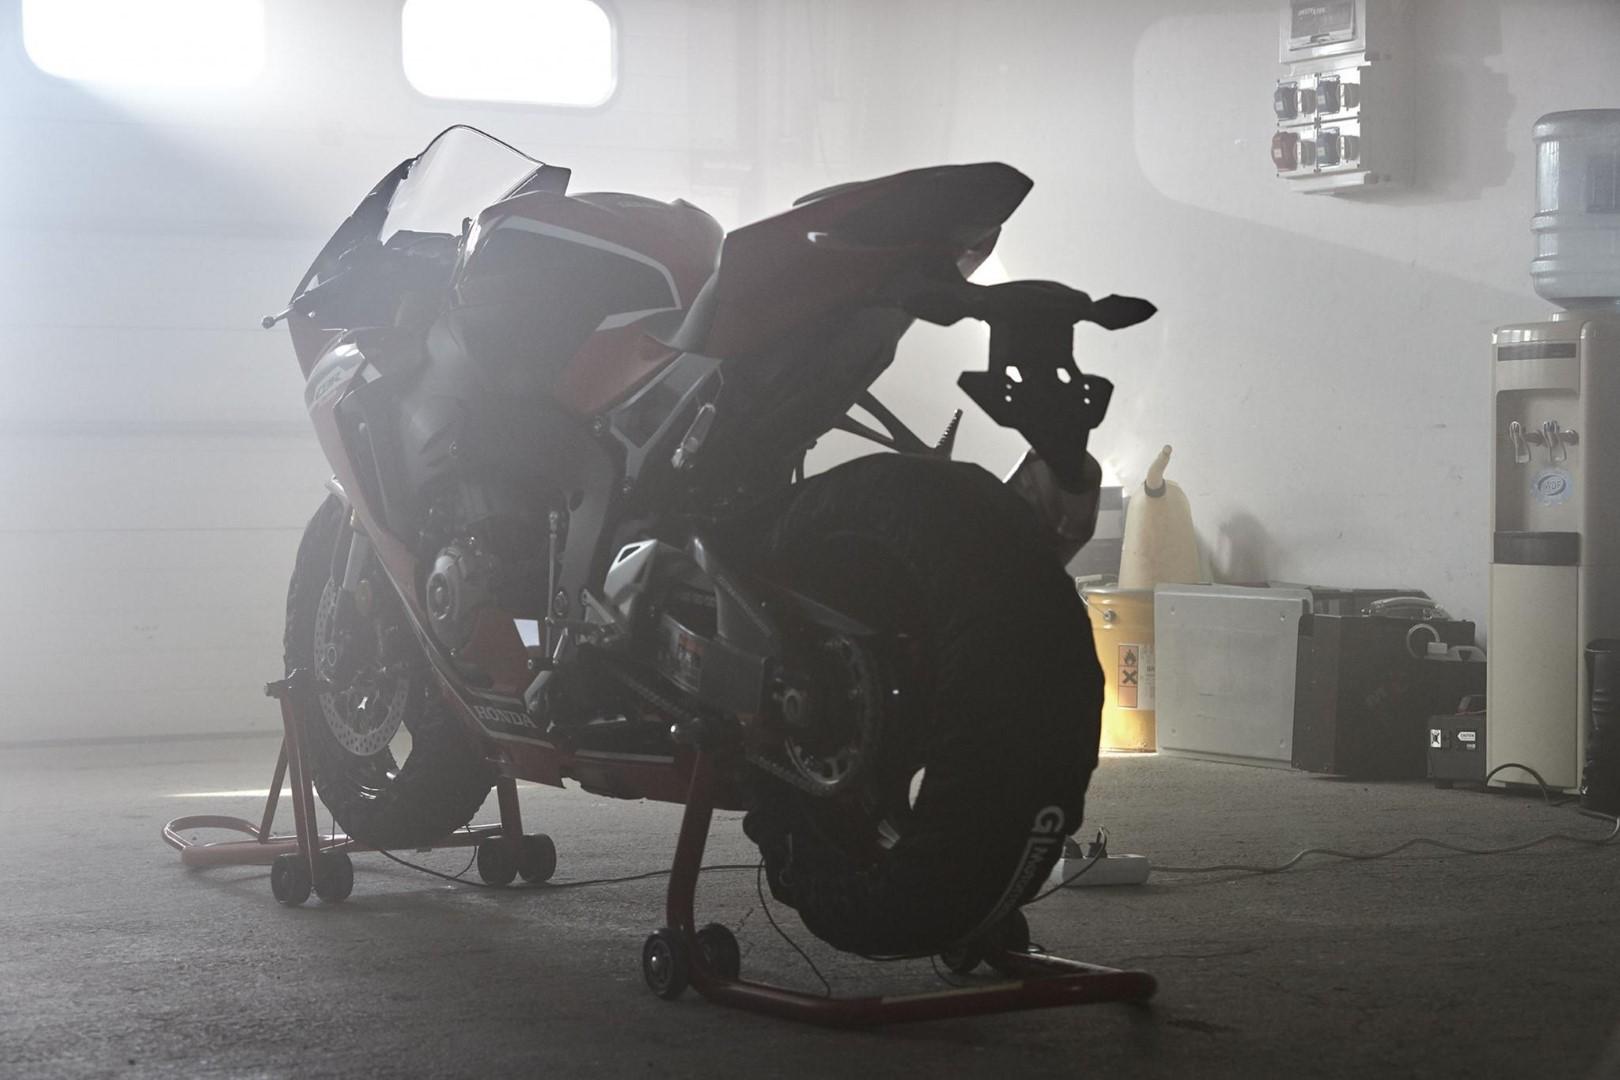 Honda CBR1000RR Fireblade 2017 fotos